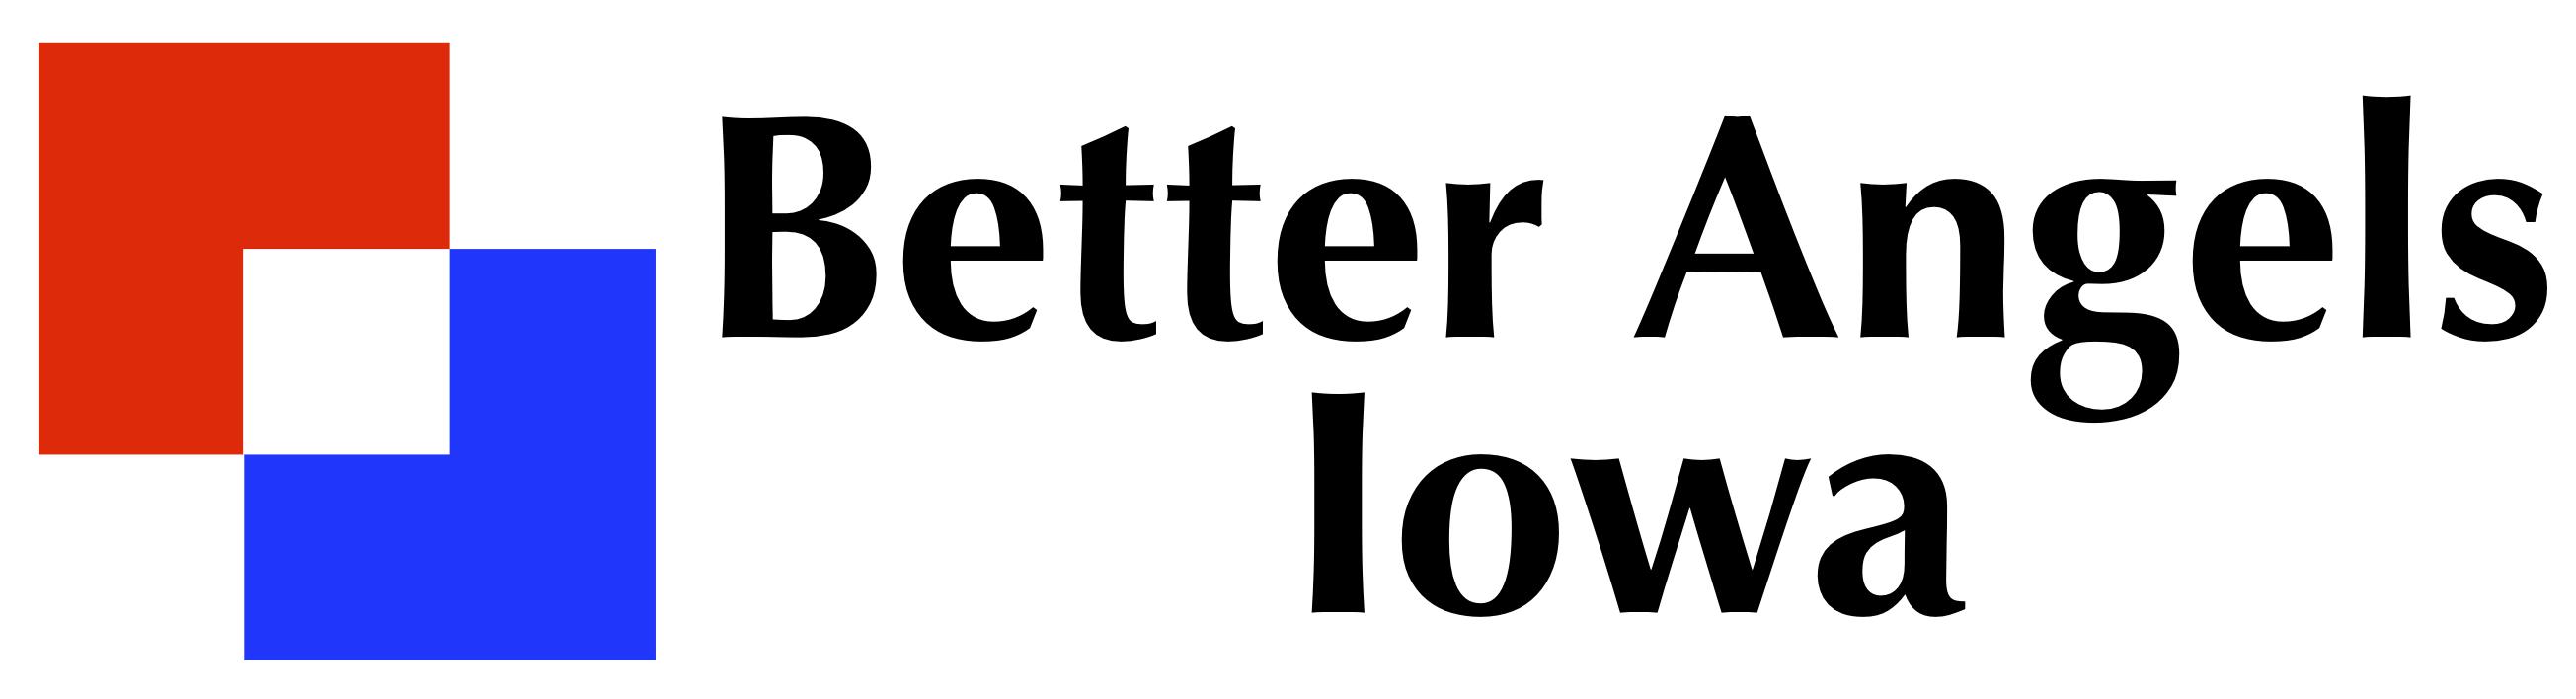 Better Angels Iowa Logo 1